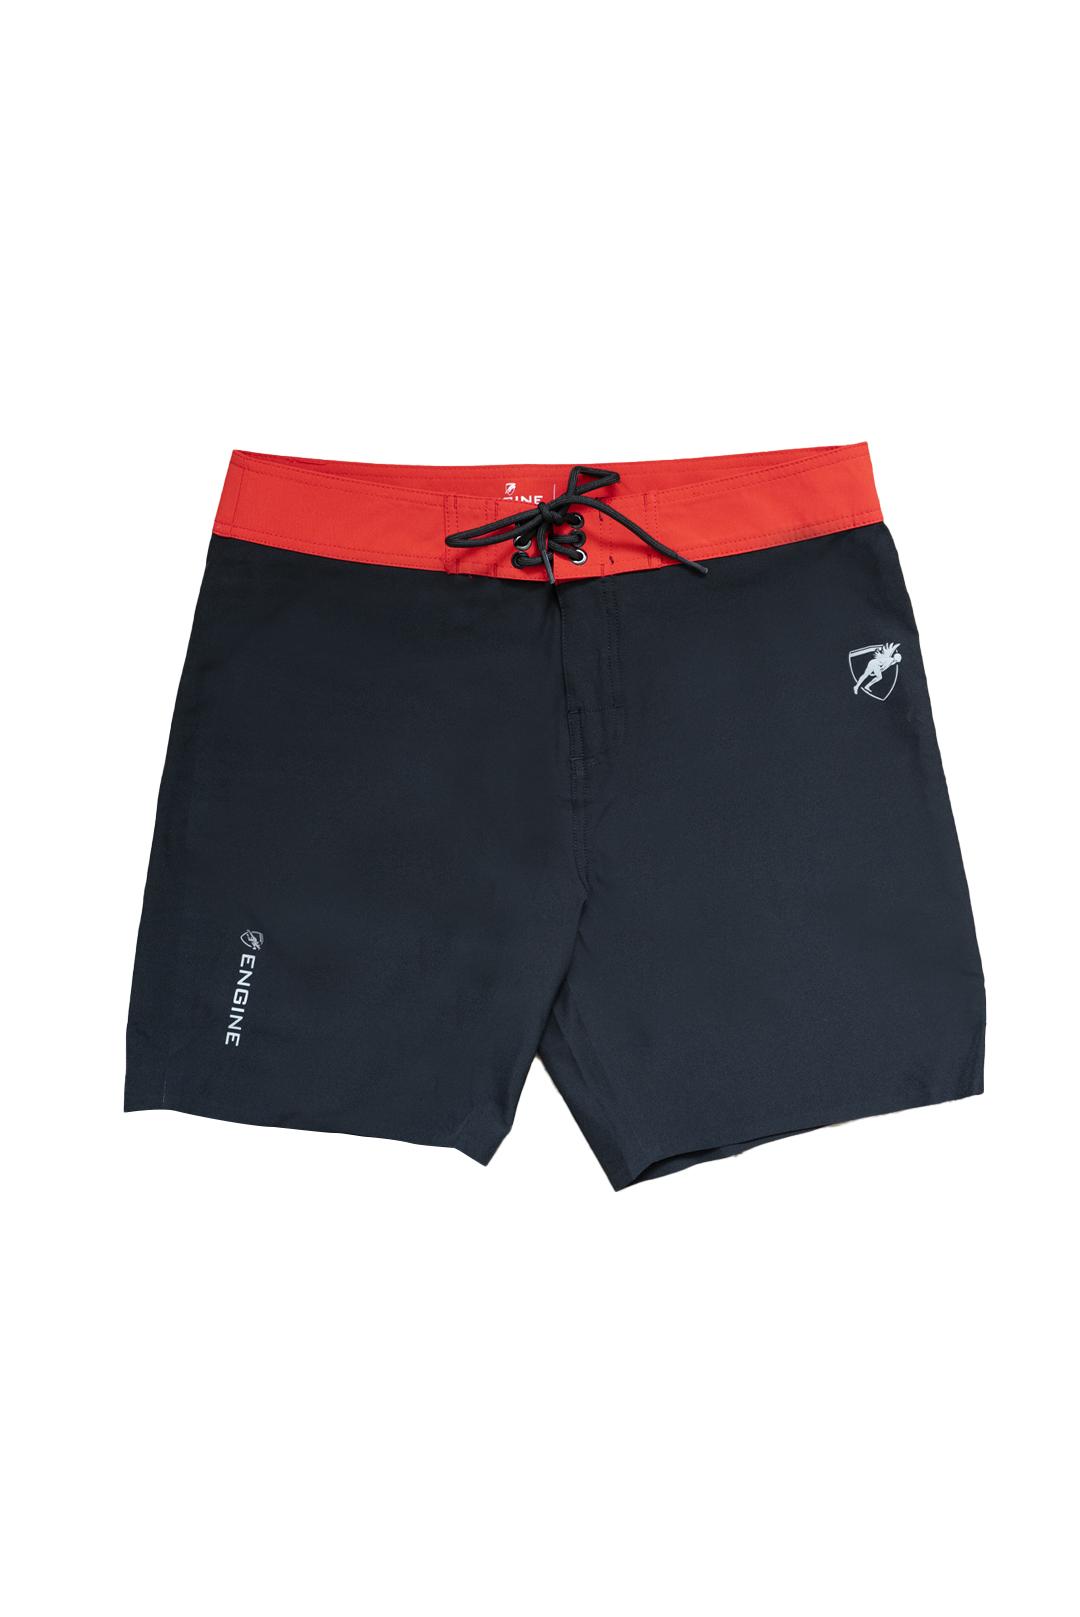 Boardshort Pro - Red